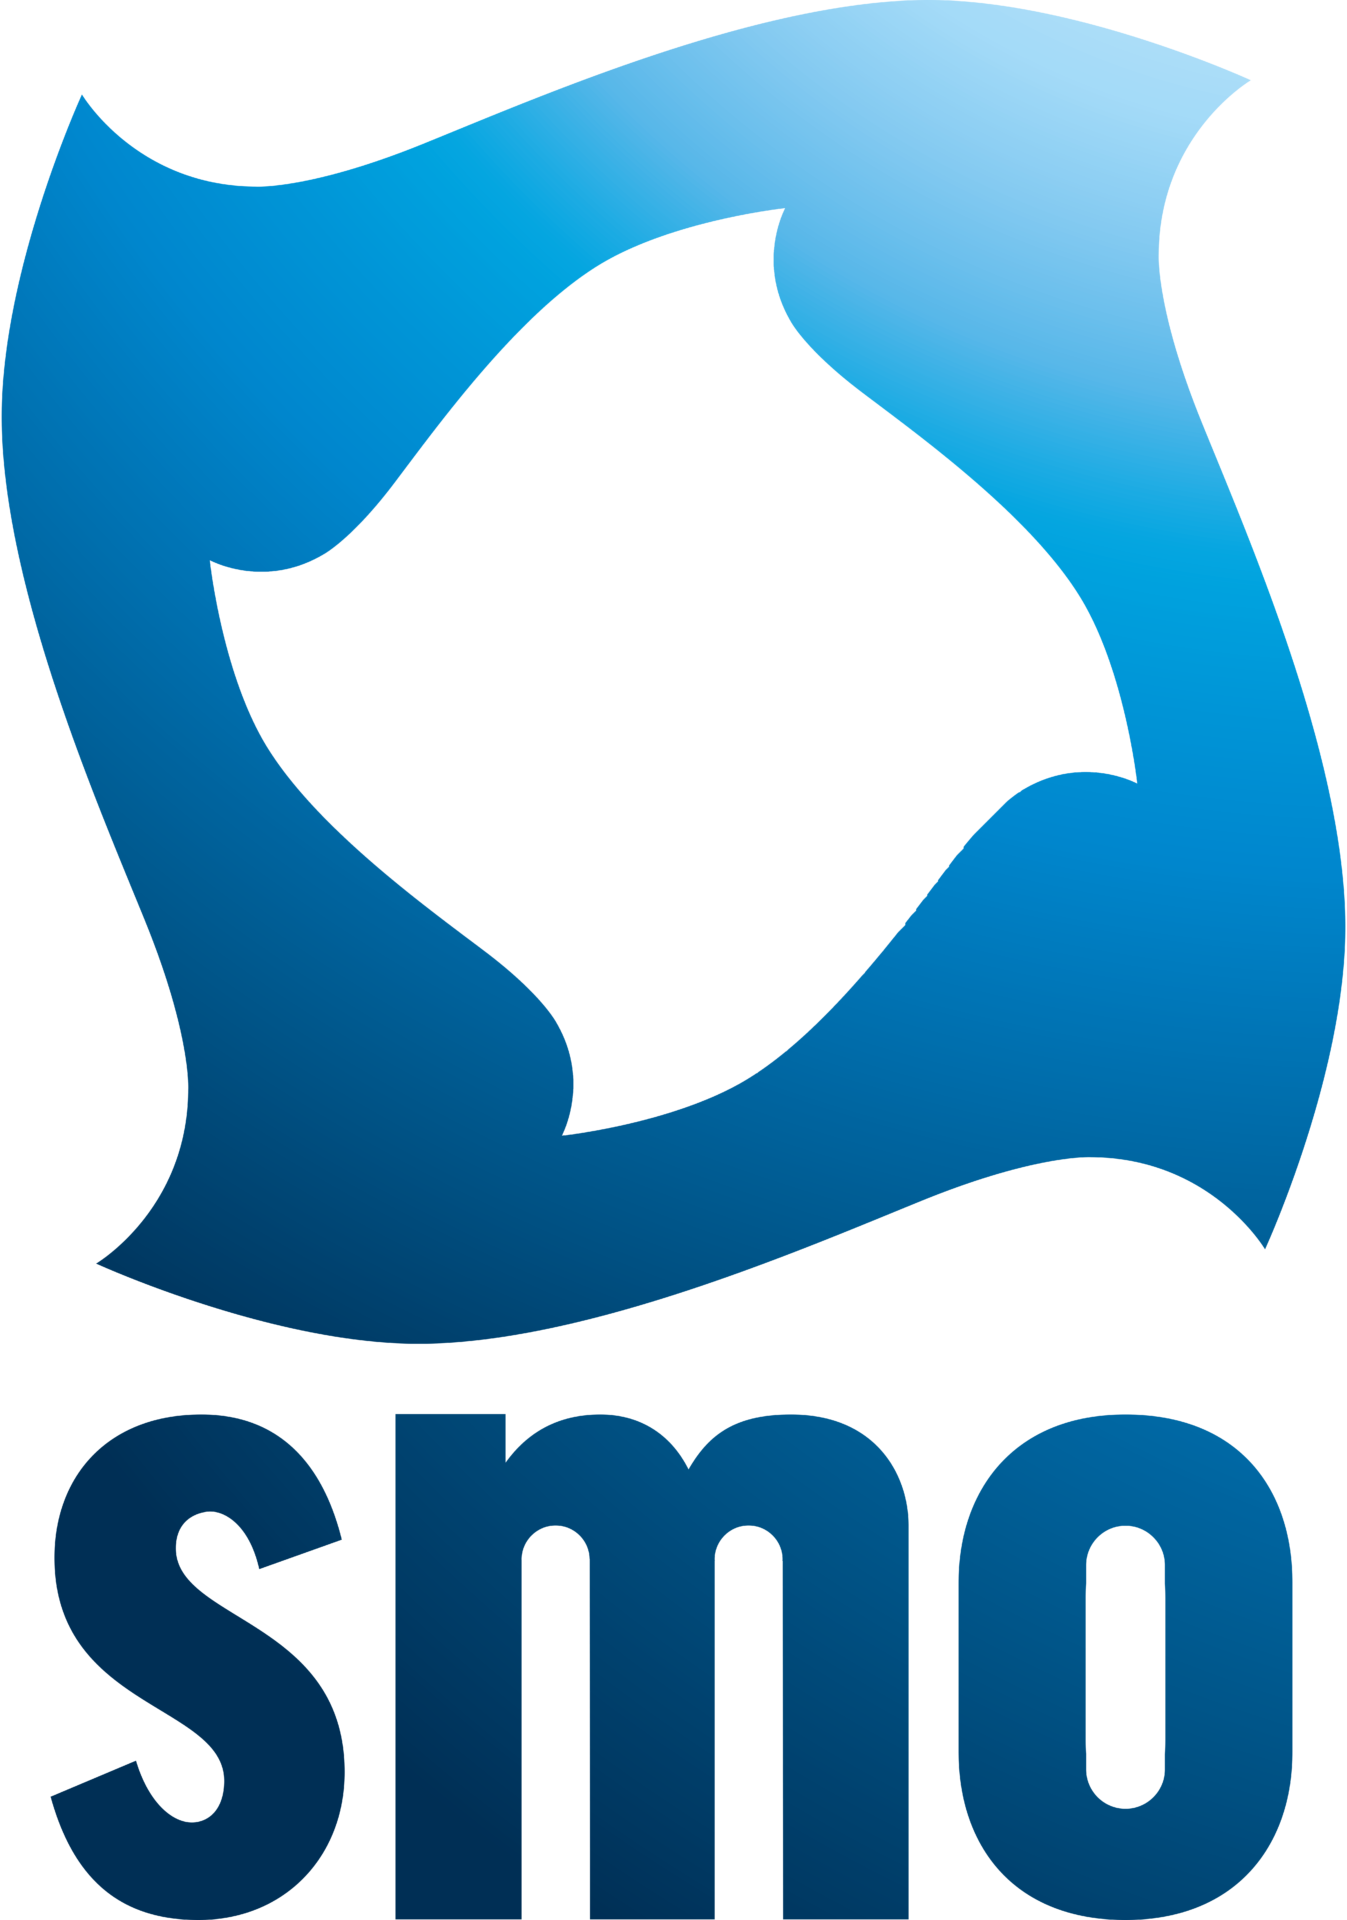 SMO-logo-png-10